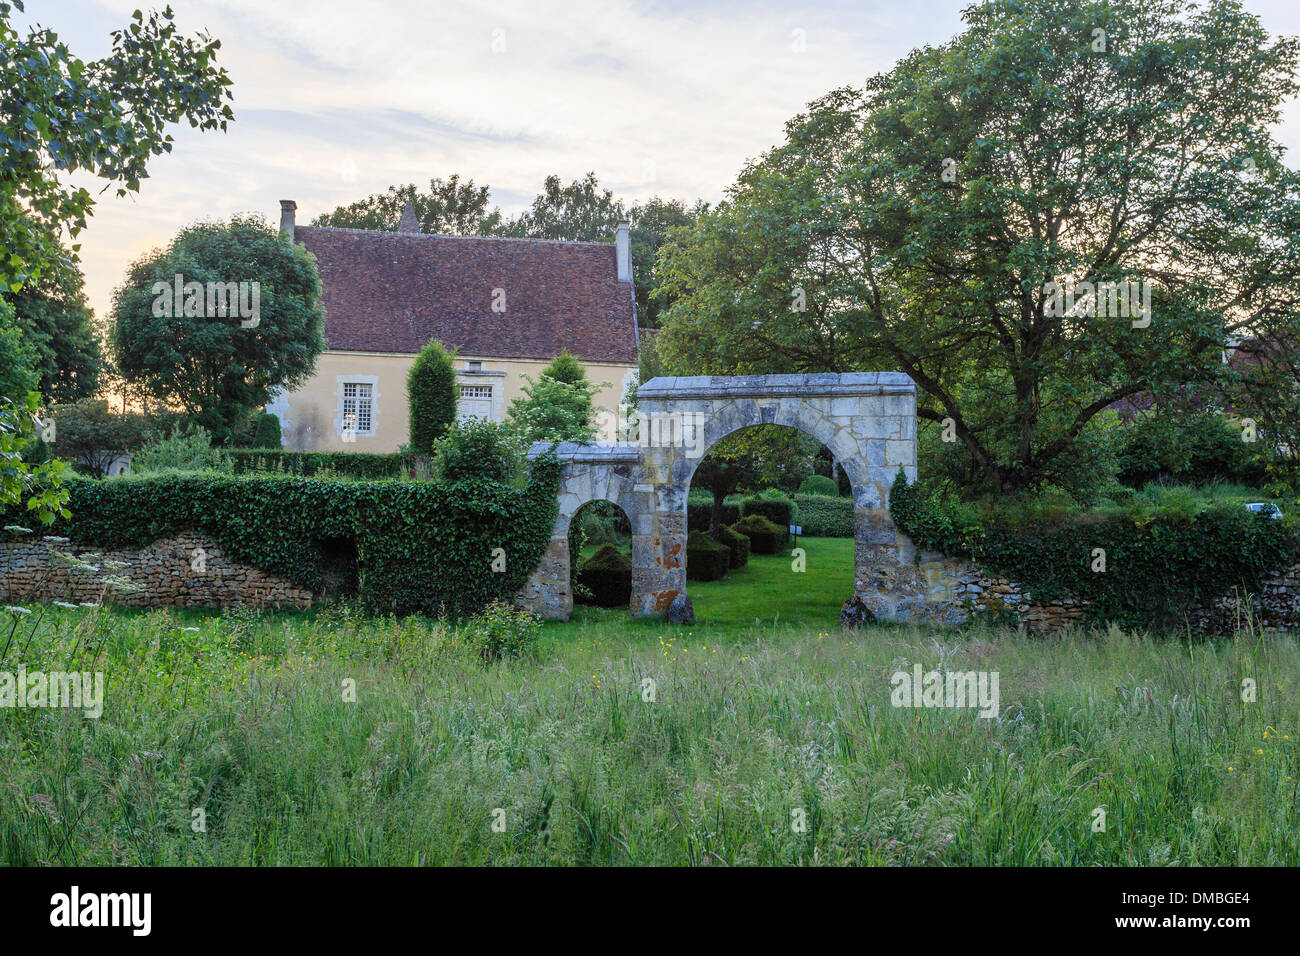 France, Orne, Monceaux au Perche, Pontgirard manor, the garden - Stock Image